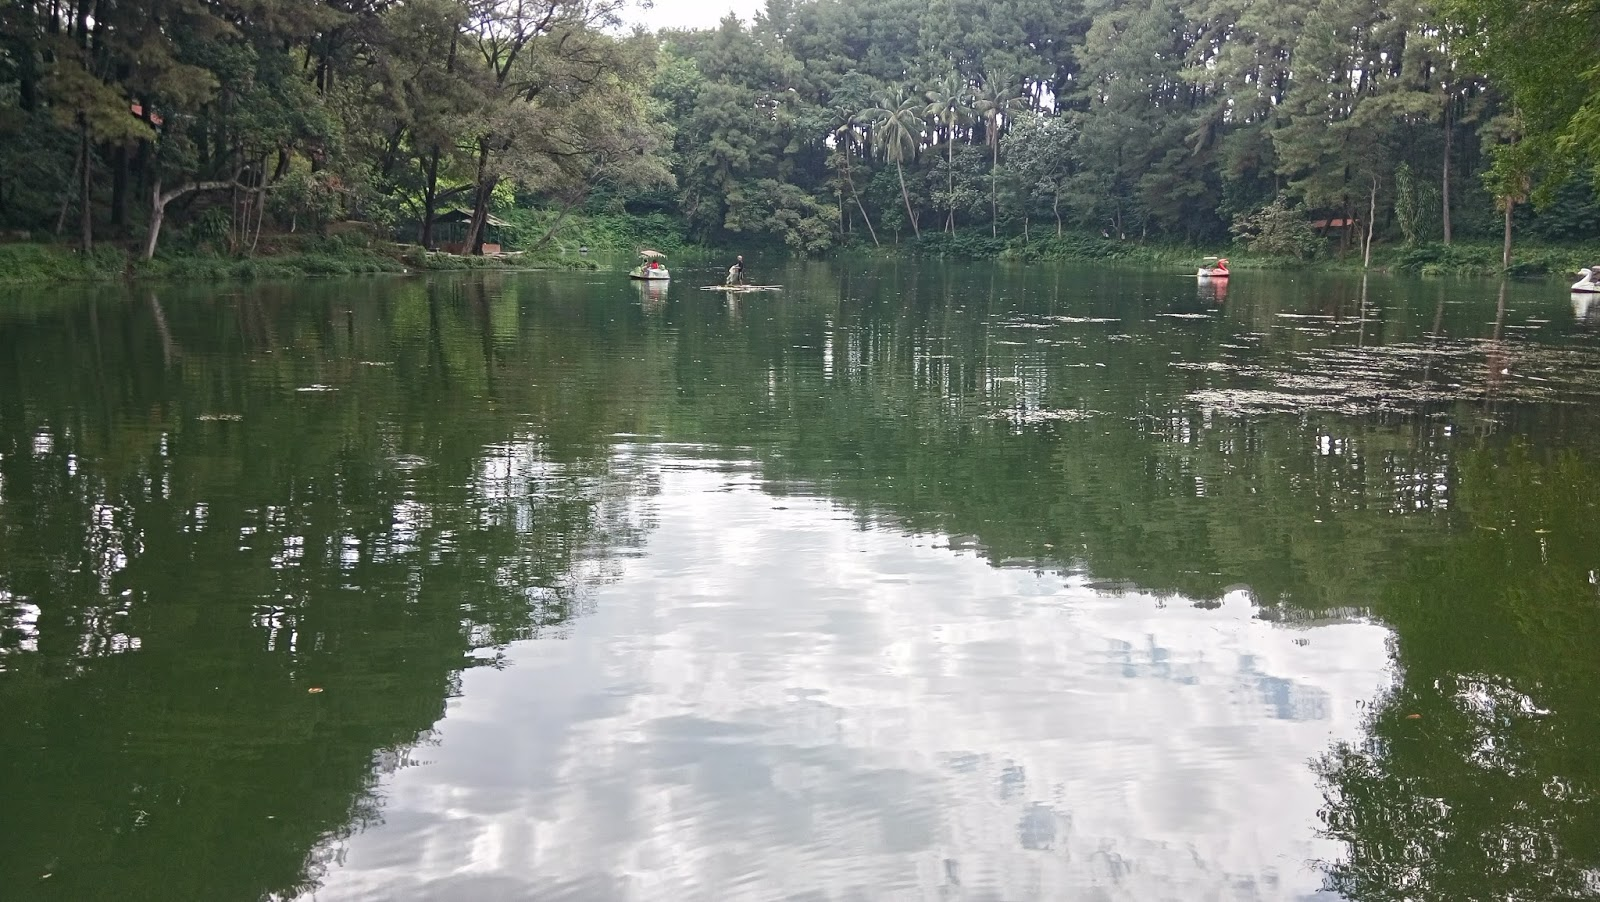 Wisata alam telaga remis Cirebon Jawa Barat